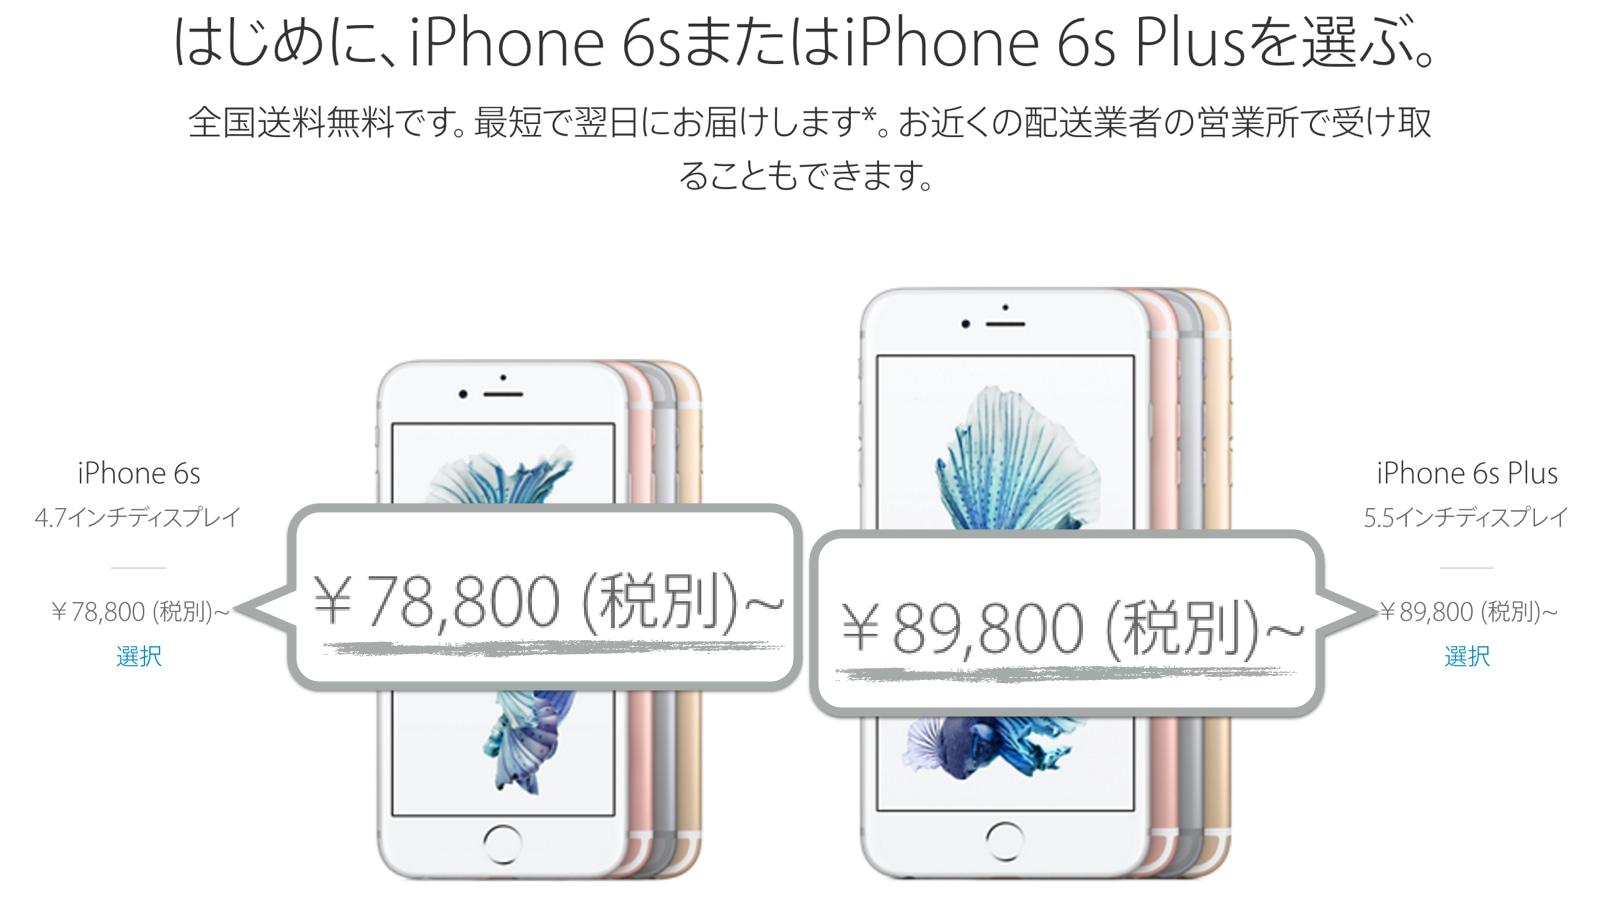 mvno-iphone5c-6s-apple-price